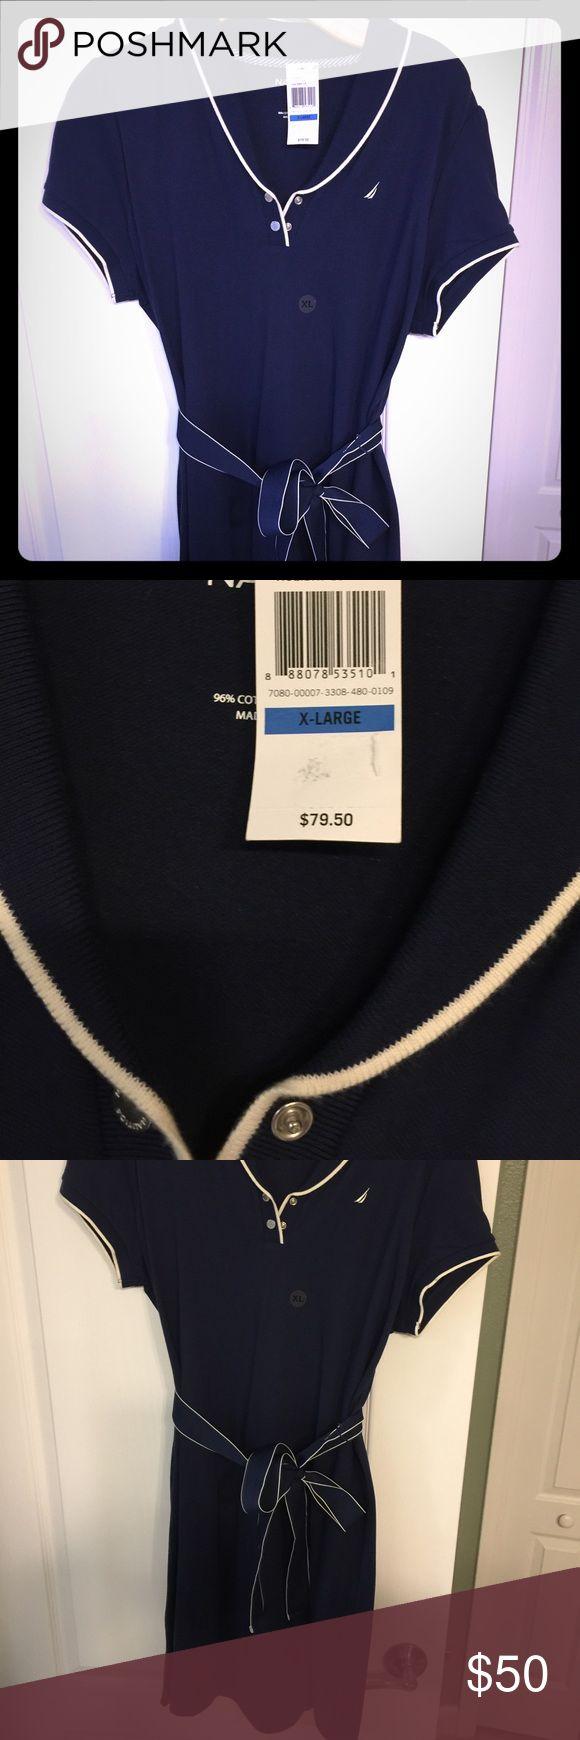 Nautica NWT navy tee shirt dress with tie Brand new tee shirt dress with tie. Nautica Dresses